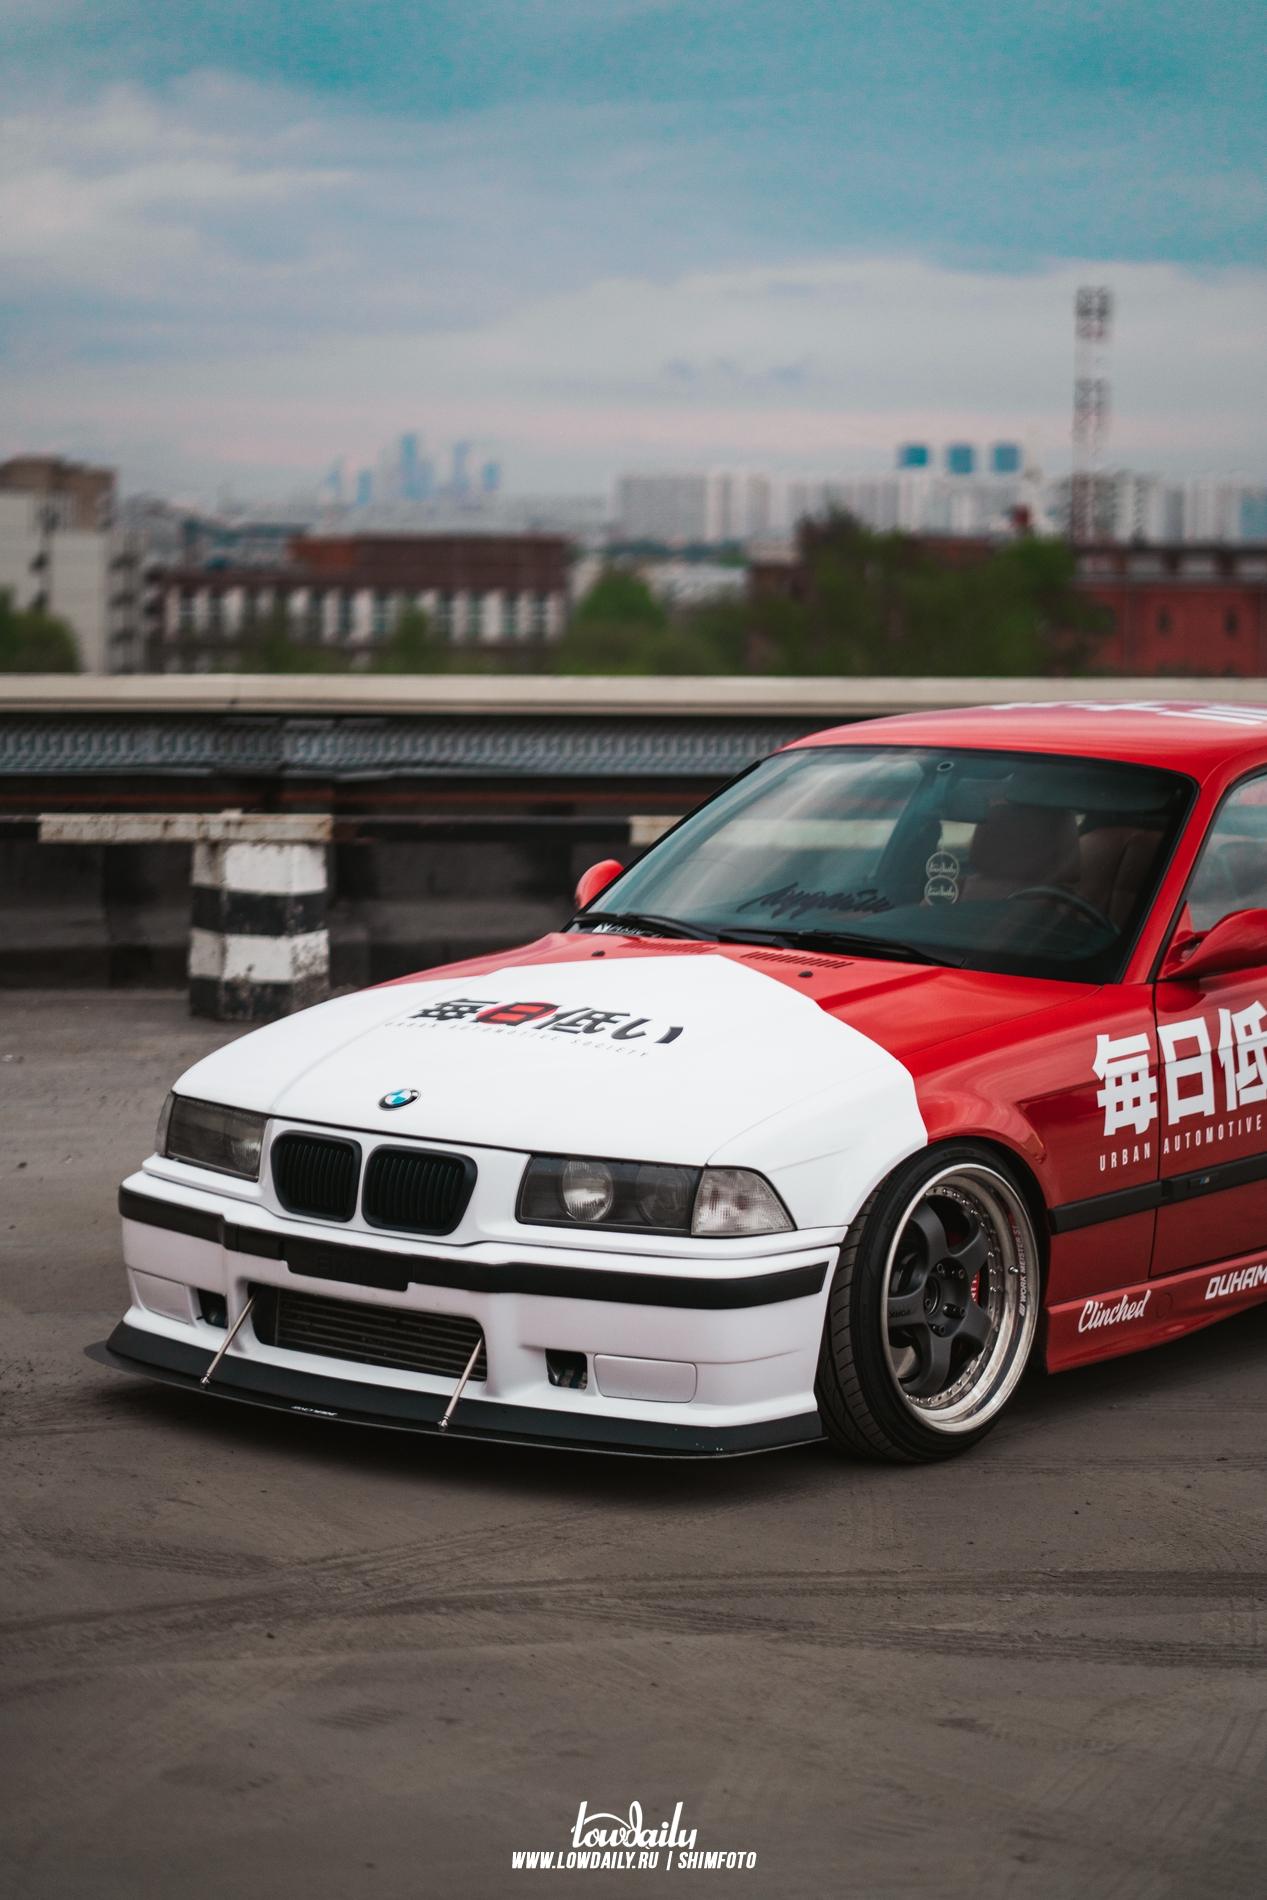 BMW E36 — Twinturbo 2JZ GTE DSC02847